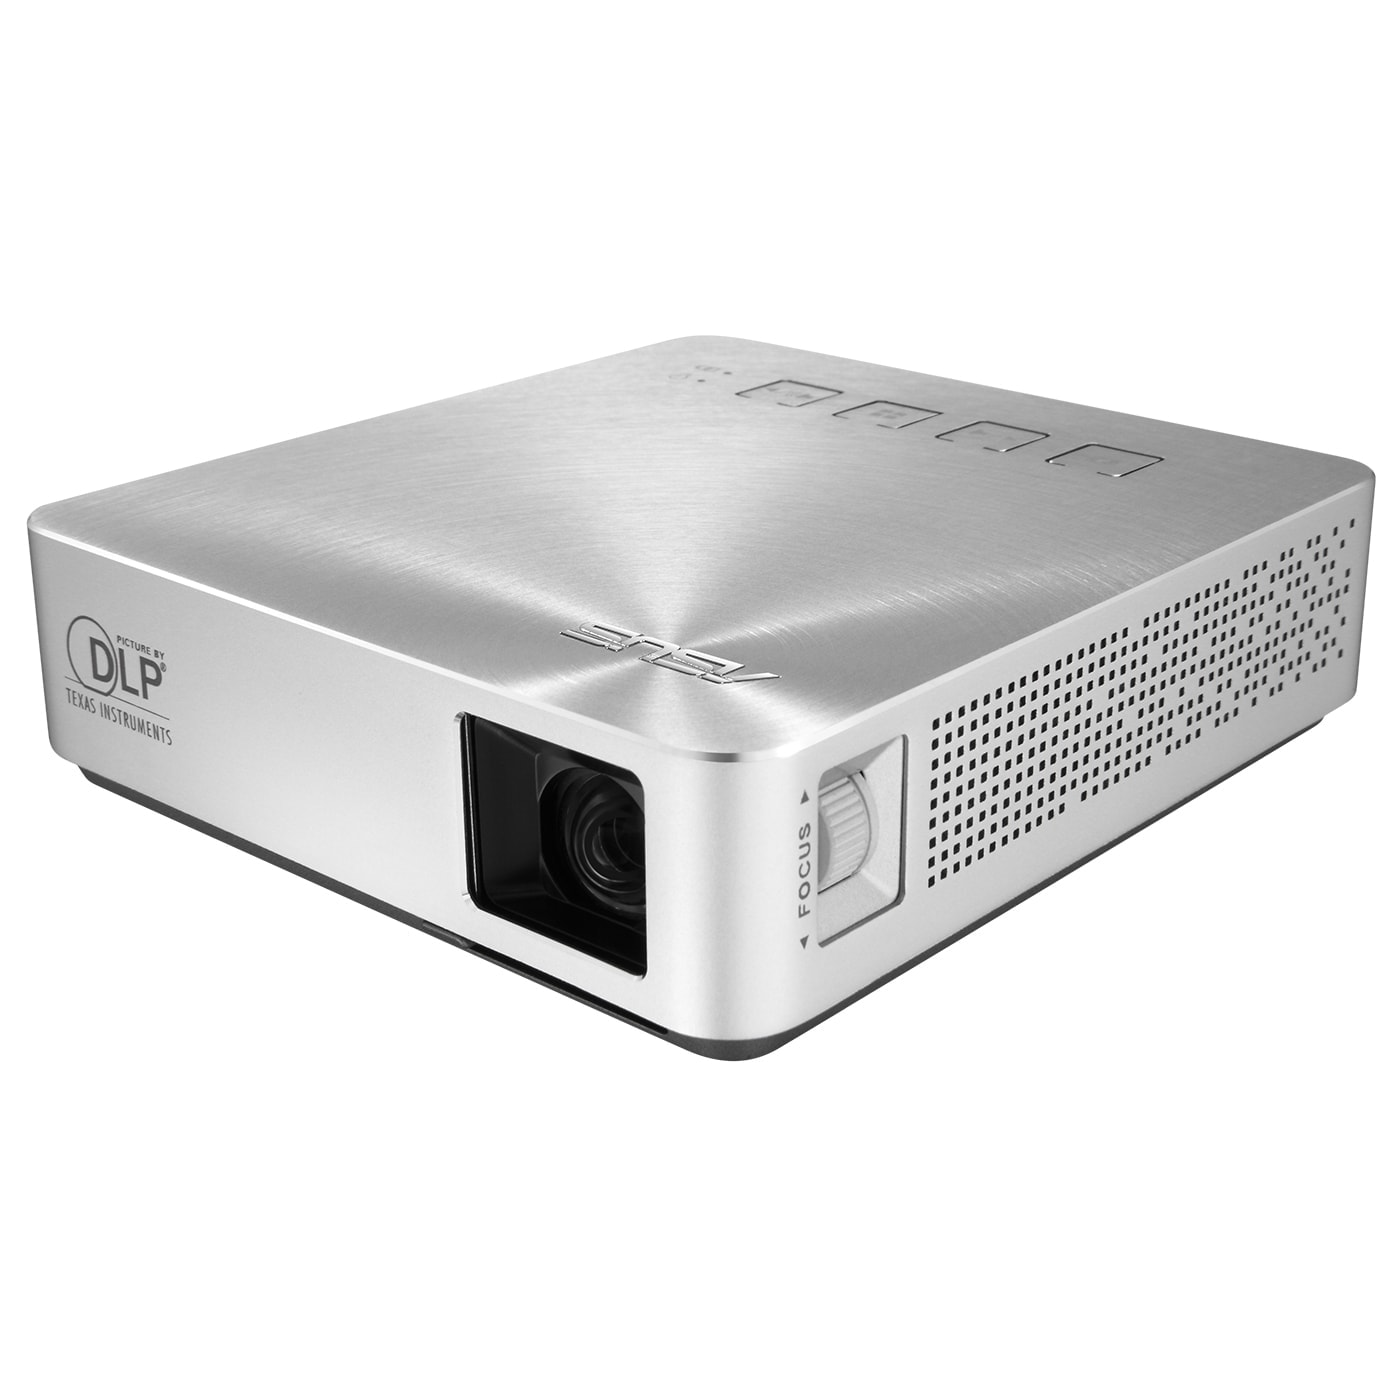 Asus S1 - Vidéoprojecteur Asus - Cybertek.fr - 3